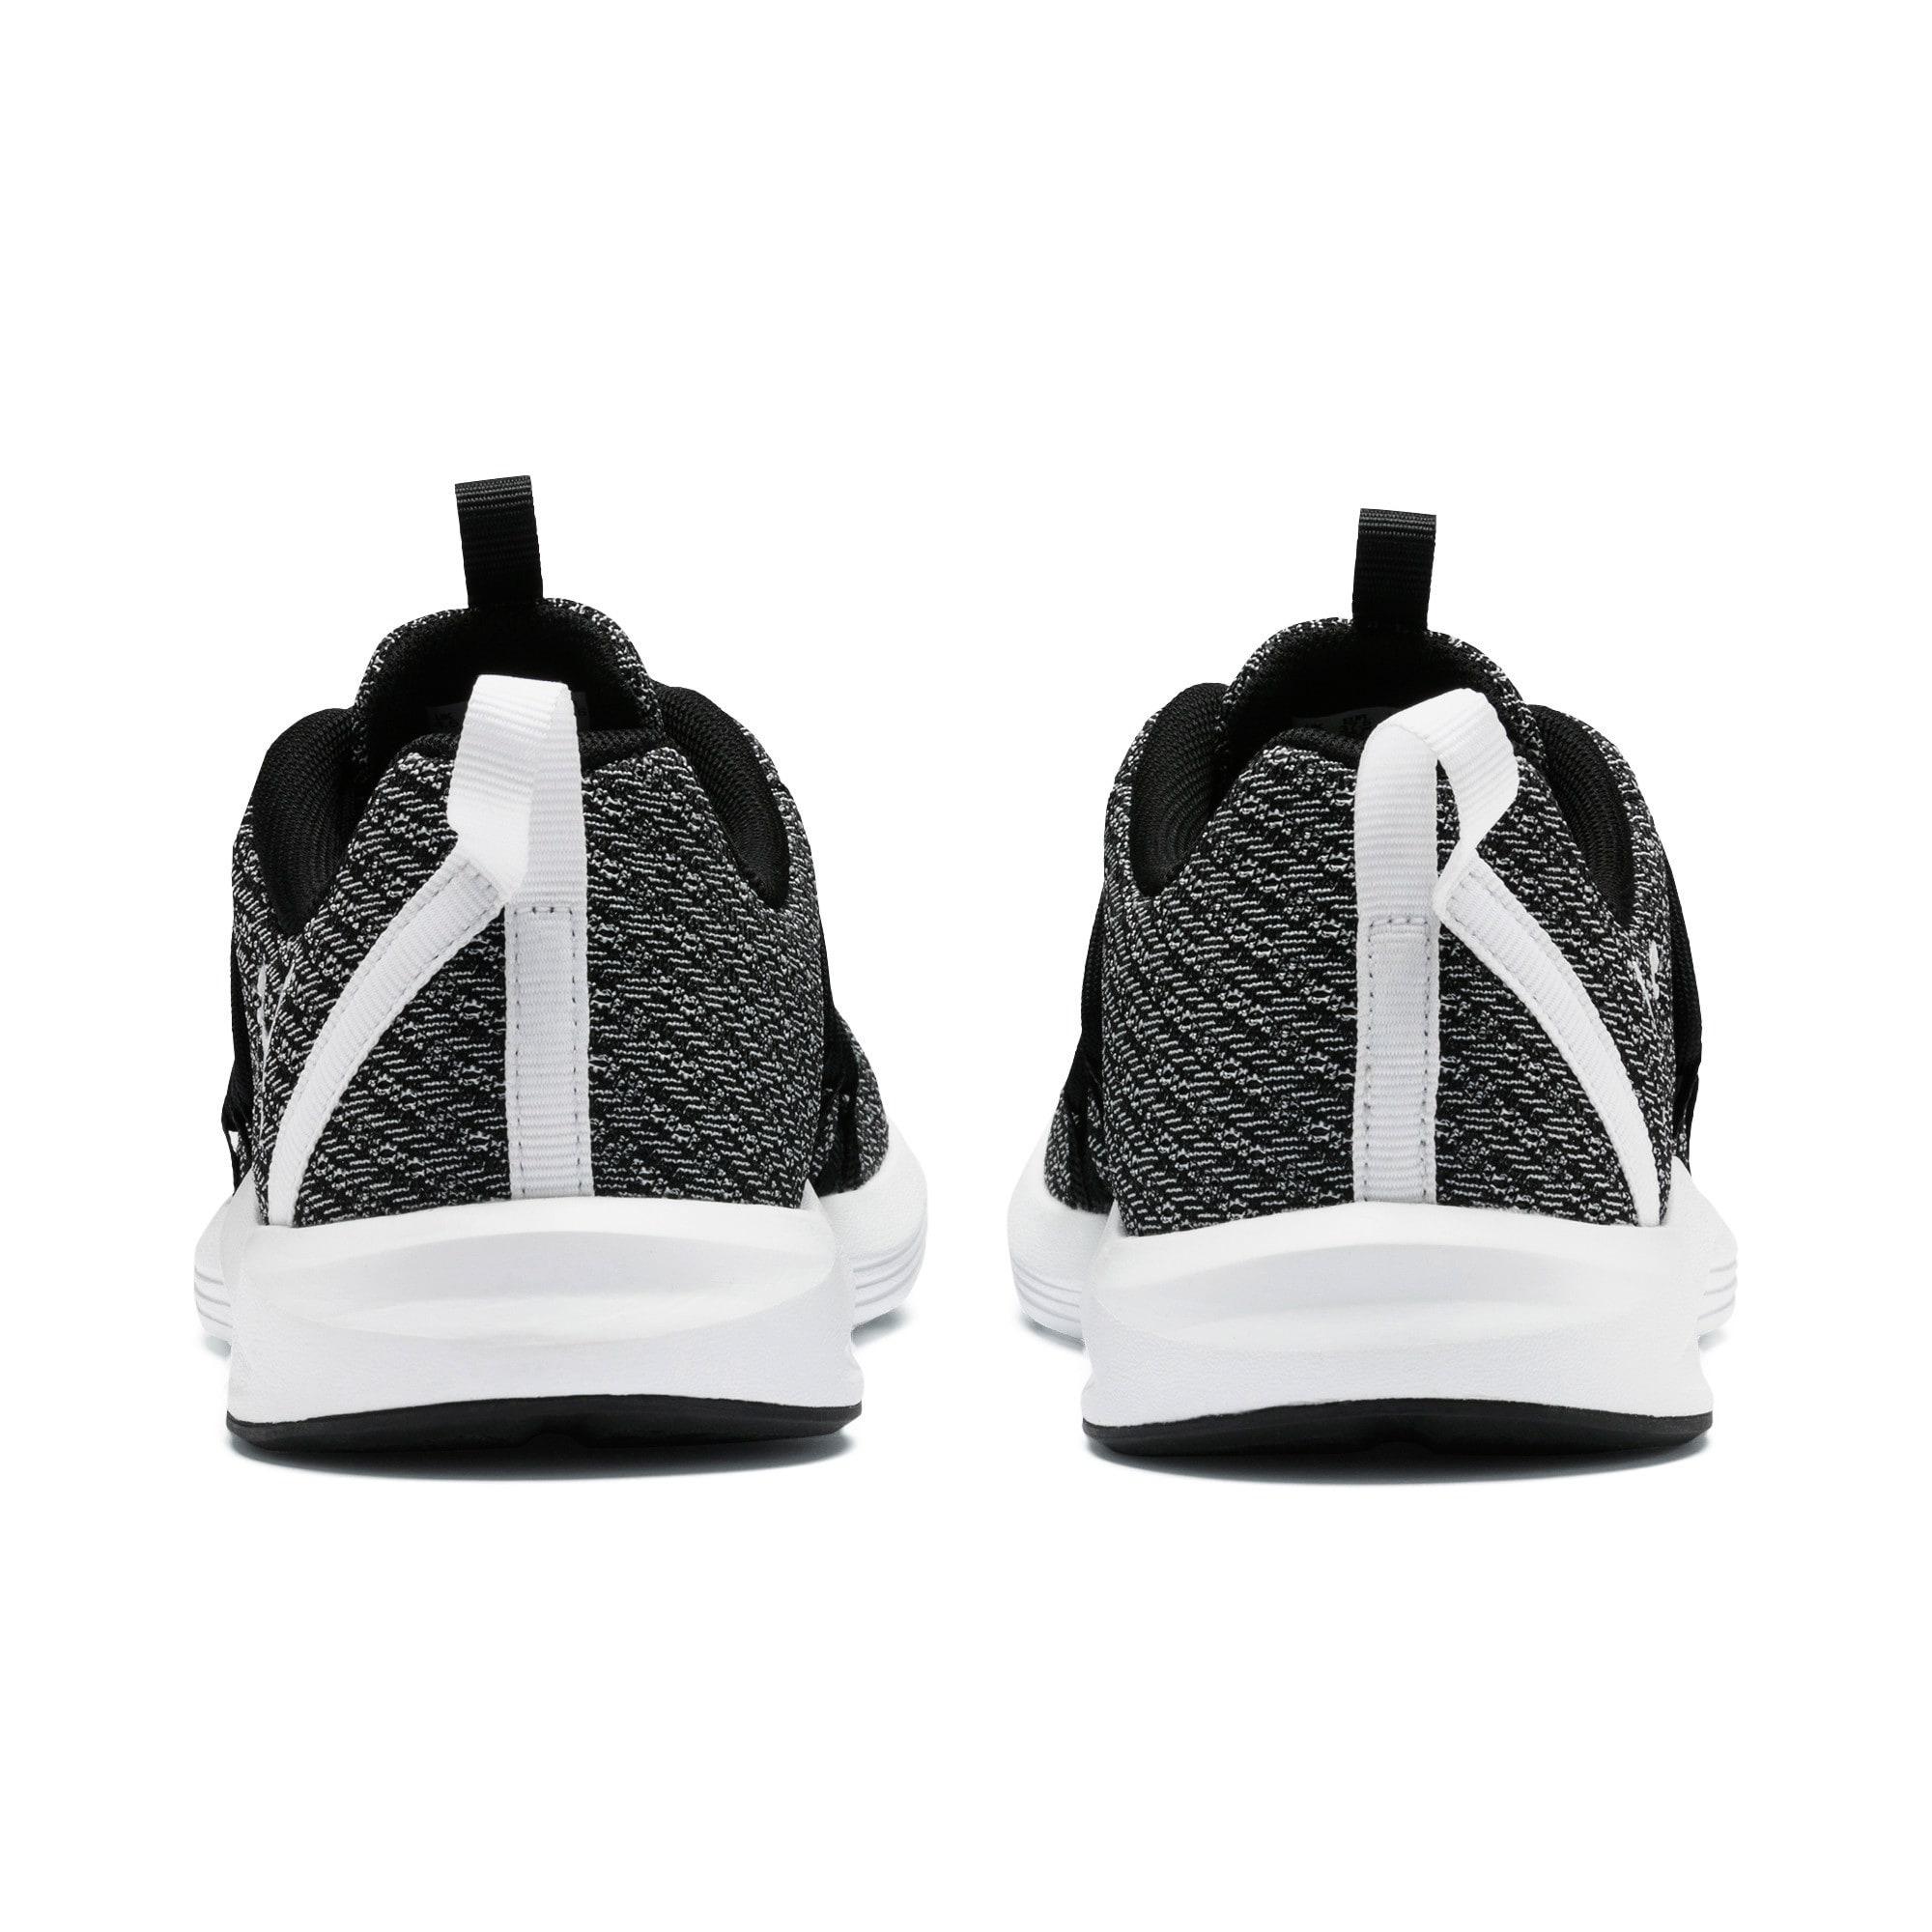 Thumbnail 4 of Prowl Alt Neon Women's Training Shoes, Puma Black-Puma White, medium